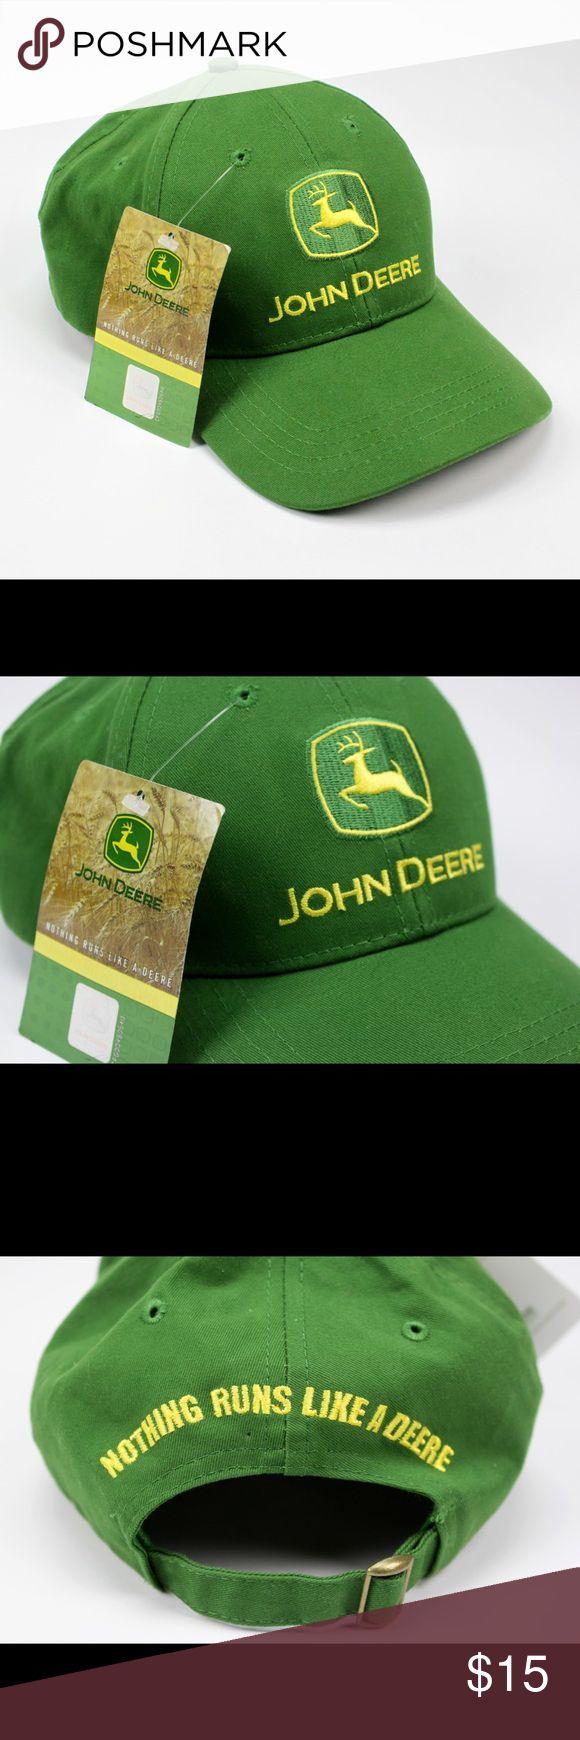 John Deere Cap - JD Green baseball cap John Deere - Nothing Runs Like A Deere cap One size - adjustable back Semi-structured Official JD product John Deere Accessories Hats